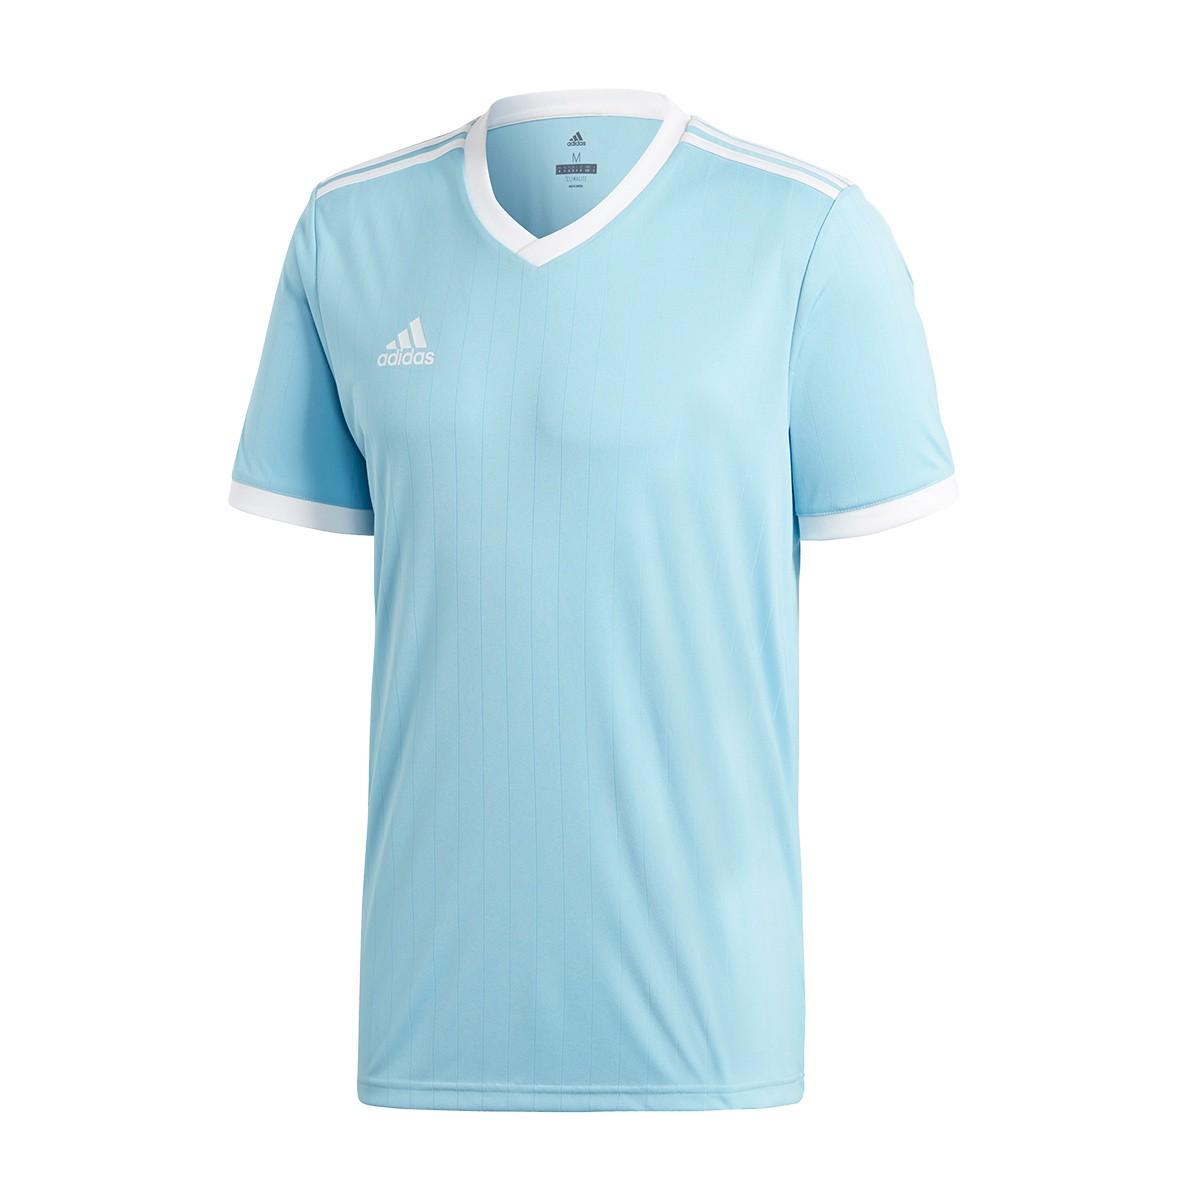 15afeaf7f Jersey adidas Tabela 18 m/c Clear blue-White - Tienda de fútbol ...